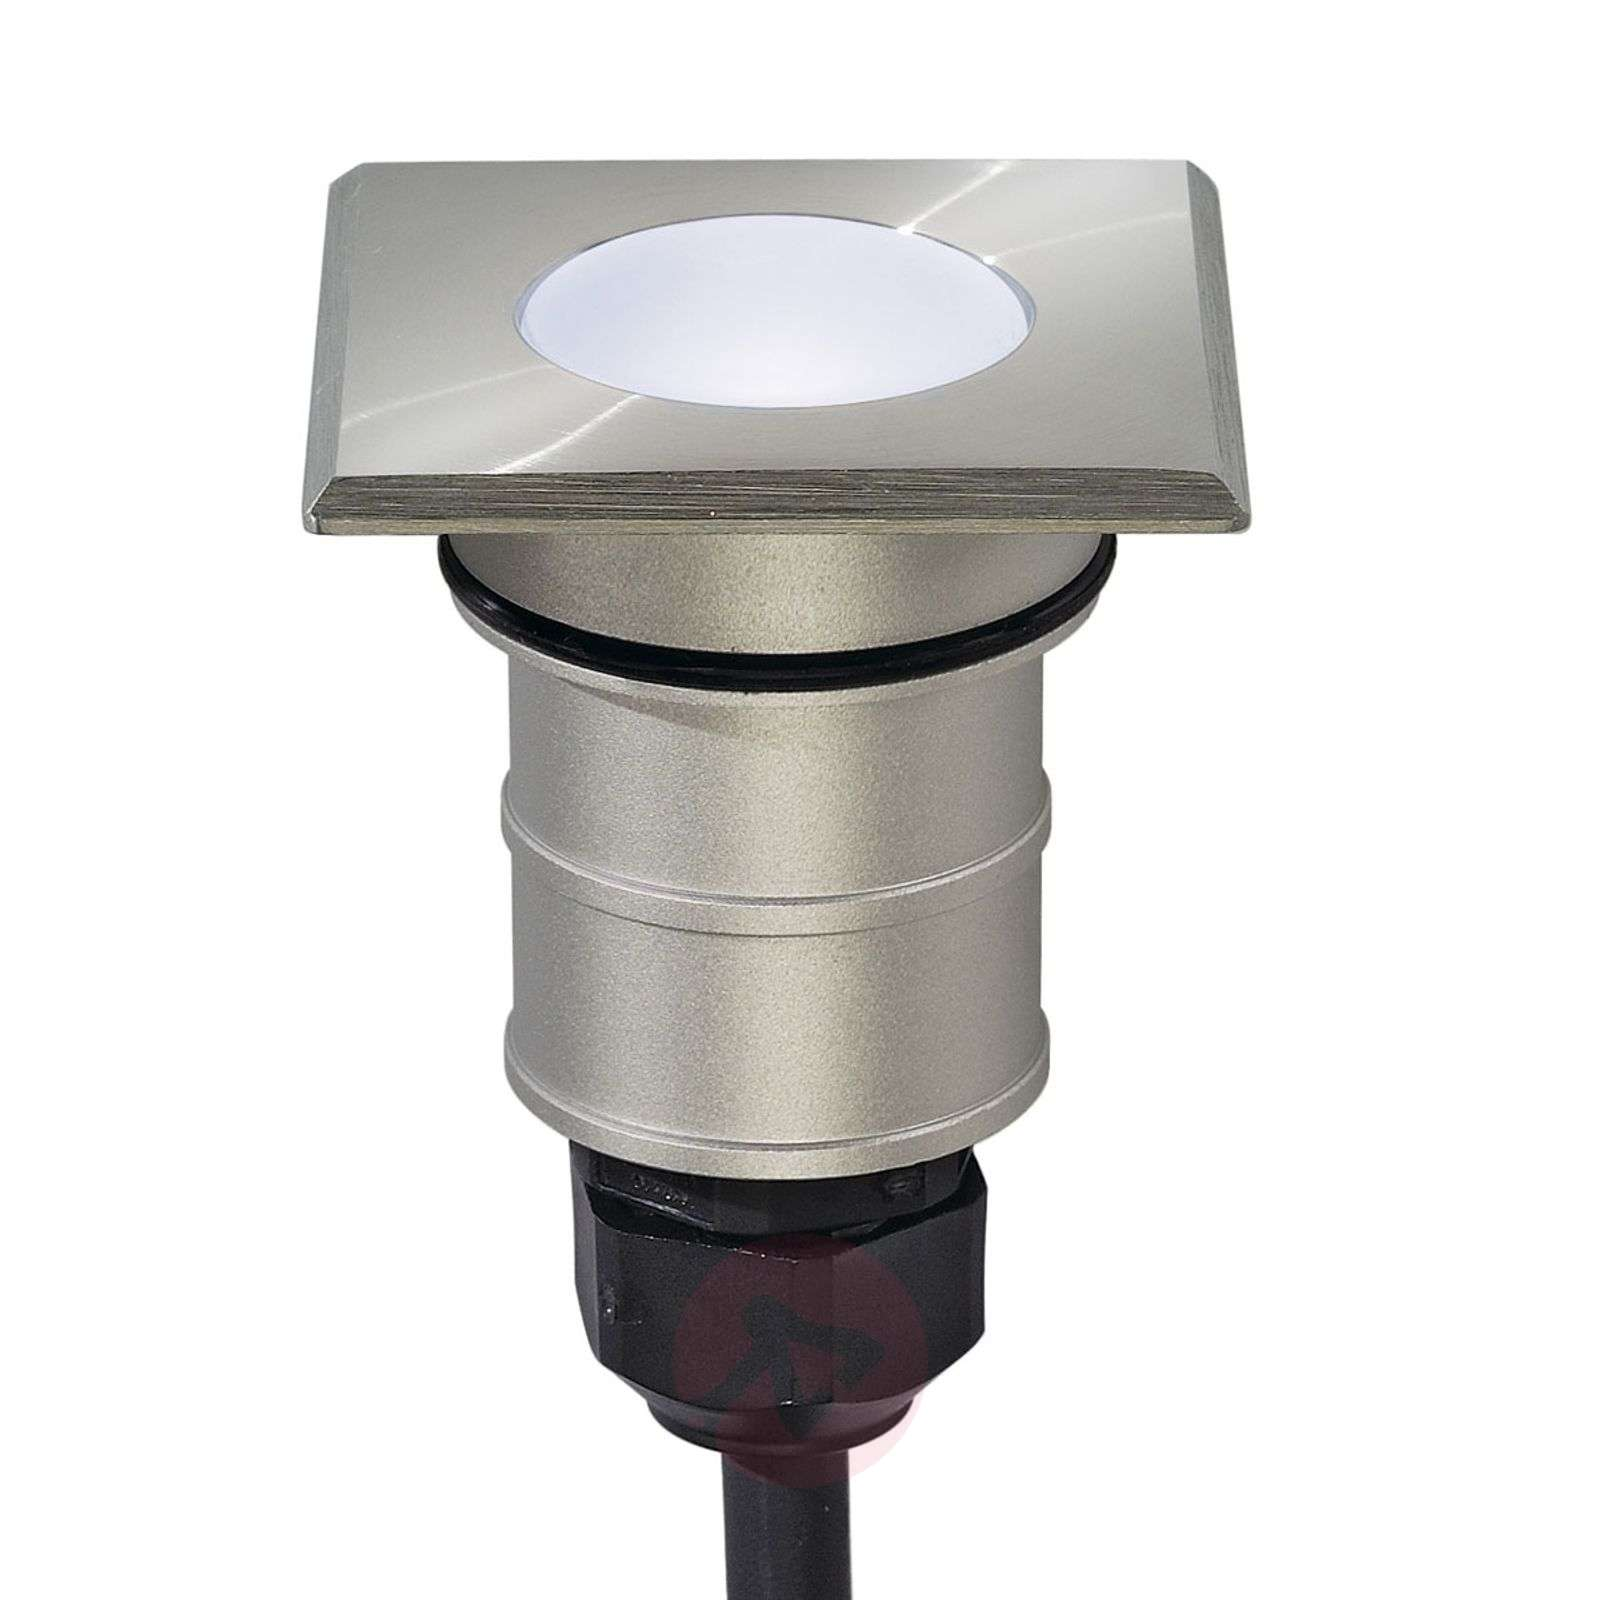 LED-maavalaisin POWER TRAIL-LITE square, 1 W, IP67-5504378X-01